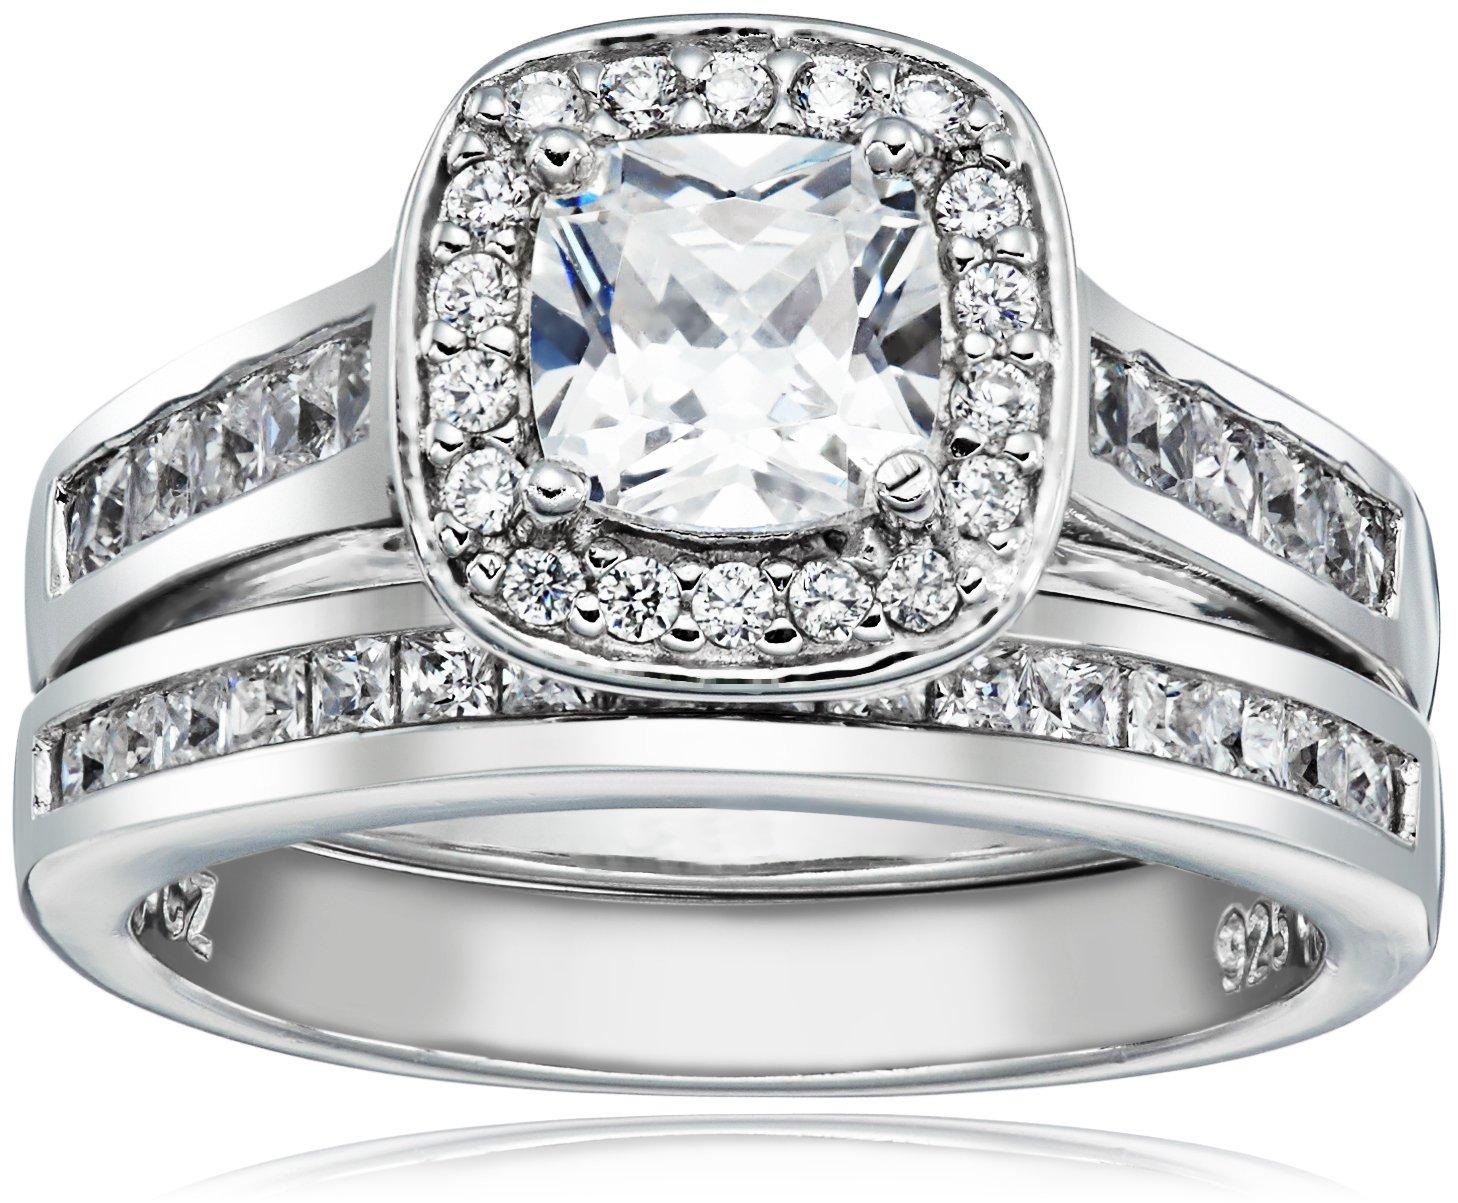 Sterling Silver Cubic Zirconia Cushion Cut Halo Channel Set Bridal Wedding Ring Set, Size 7